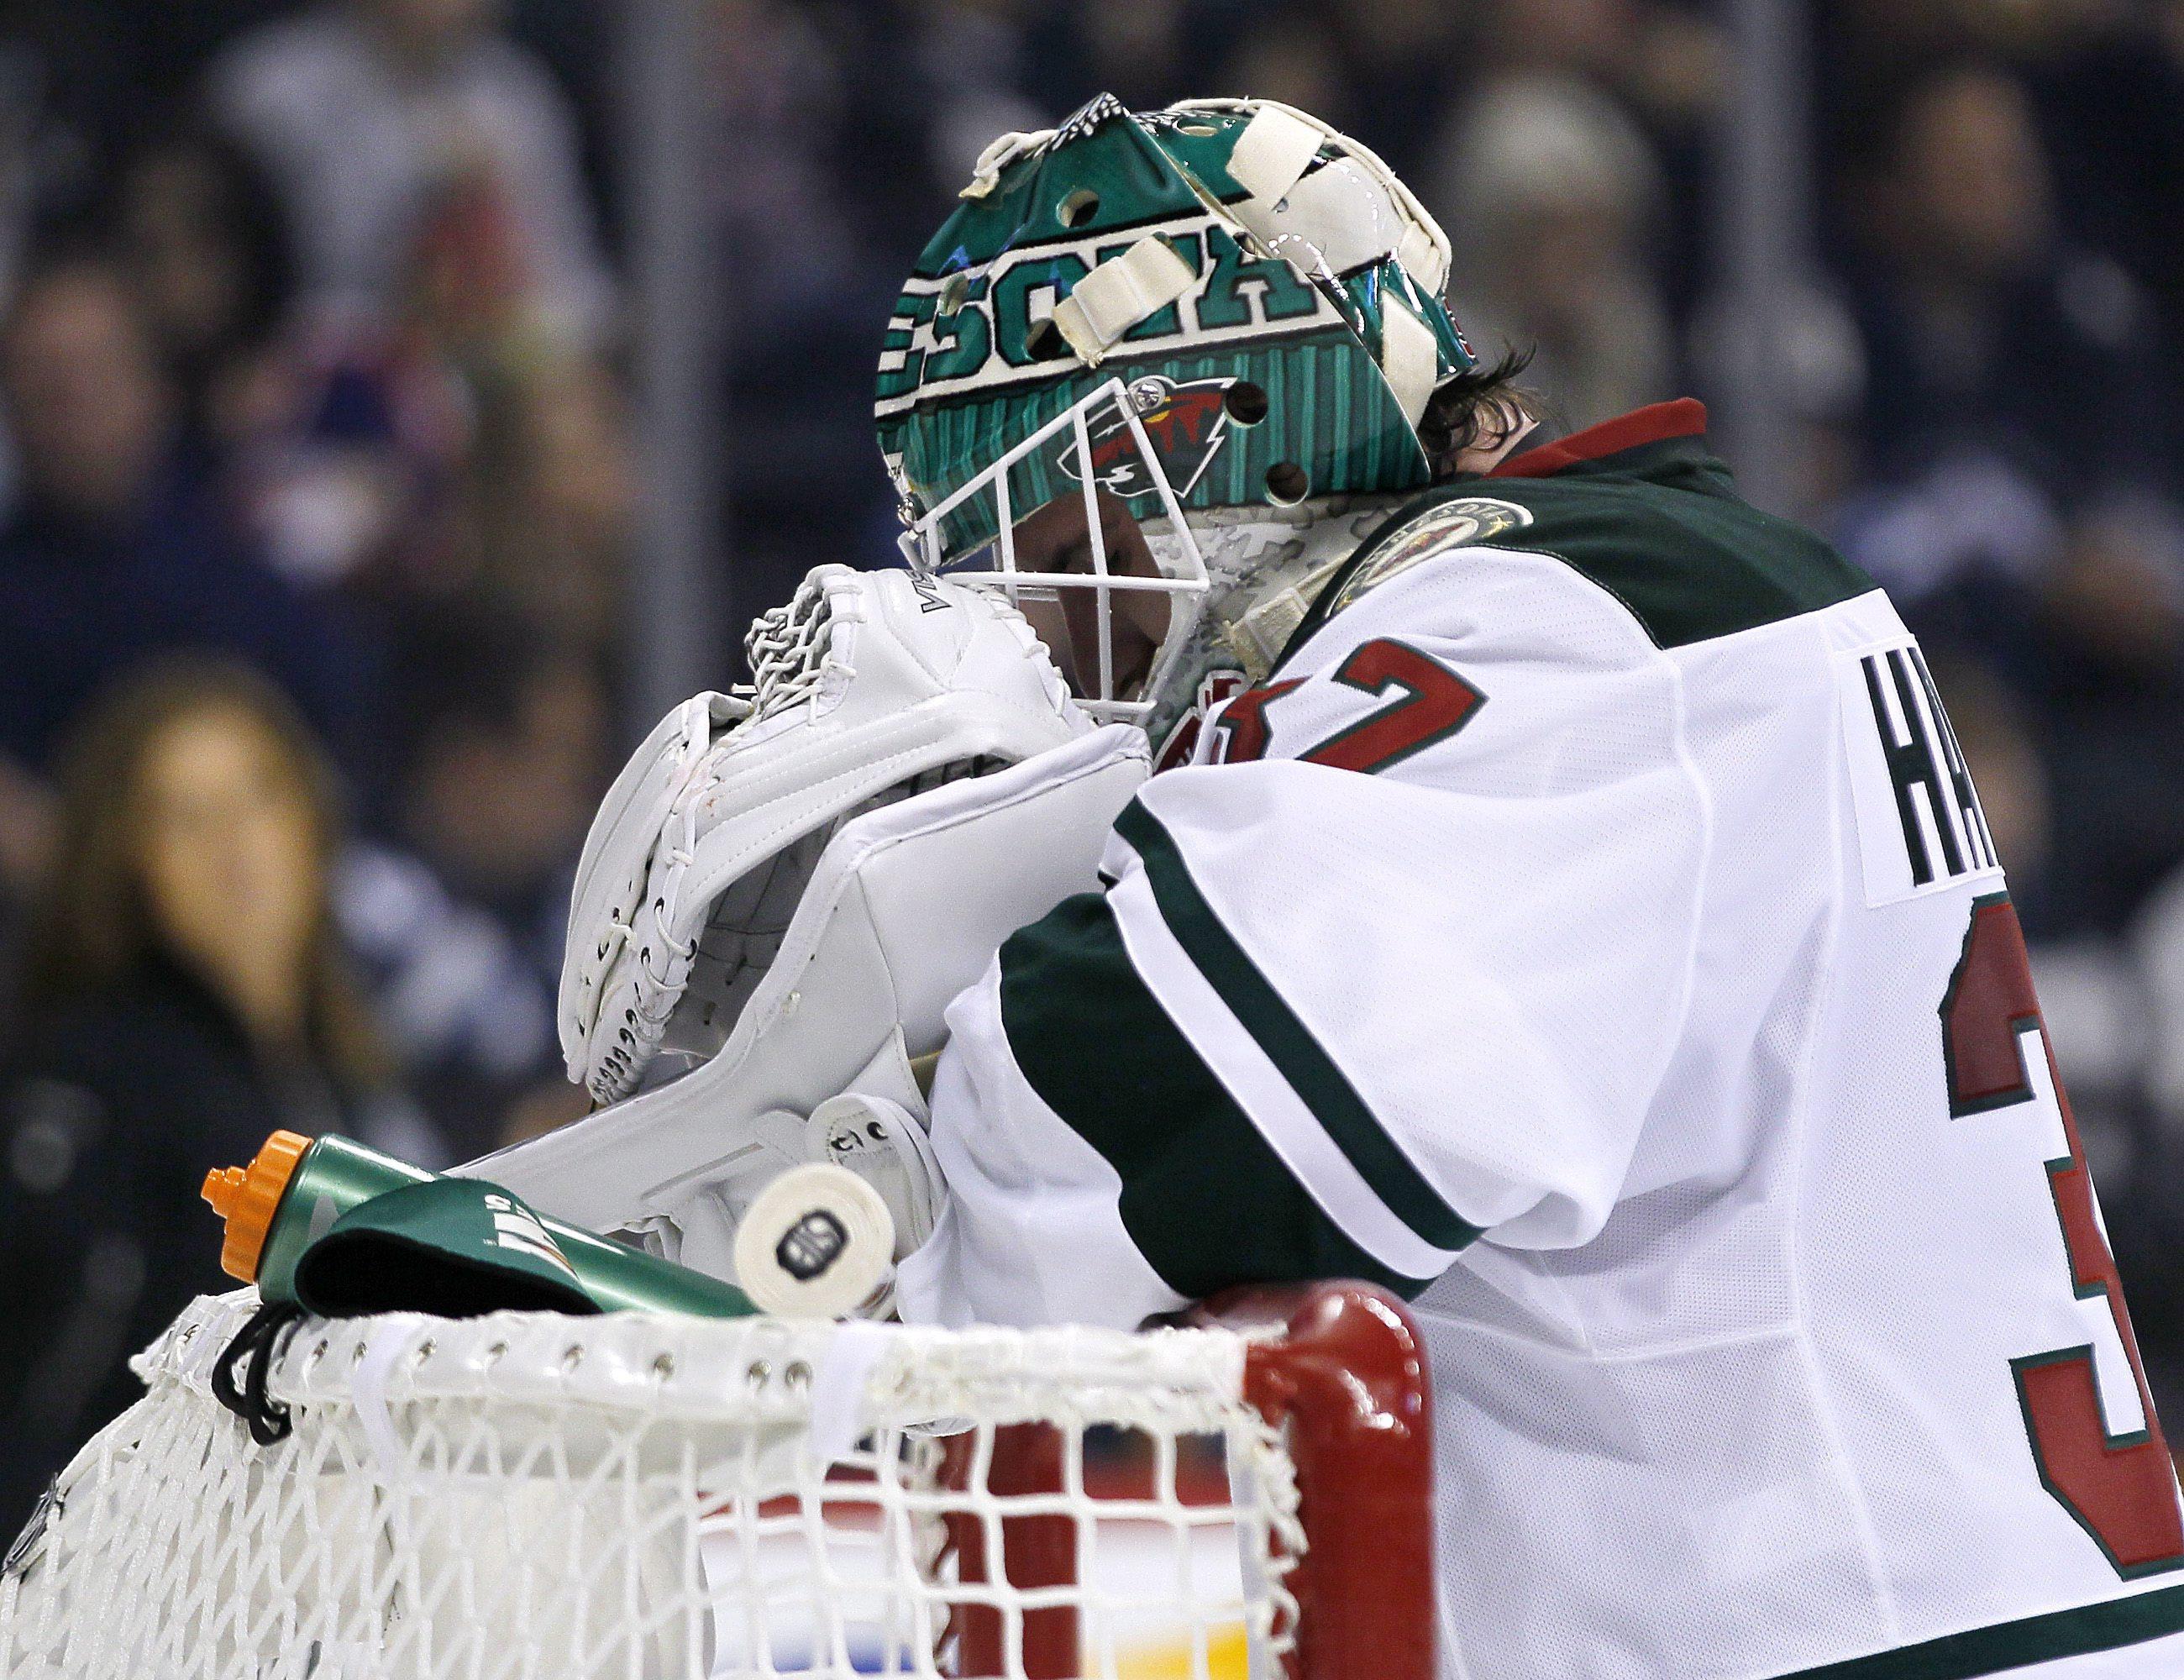 Minnesota Wild goaltender Josh Harding (37) takes a breather during second -period preseason NHL hocky game action against the Winnipeg Jets in Winnipeg, Manitoba, Thursday, Sept. 19, 2013